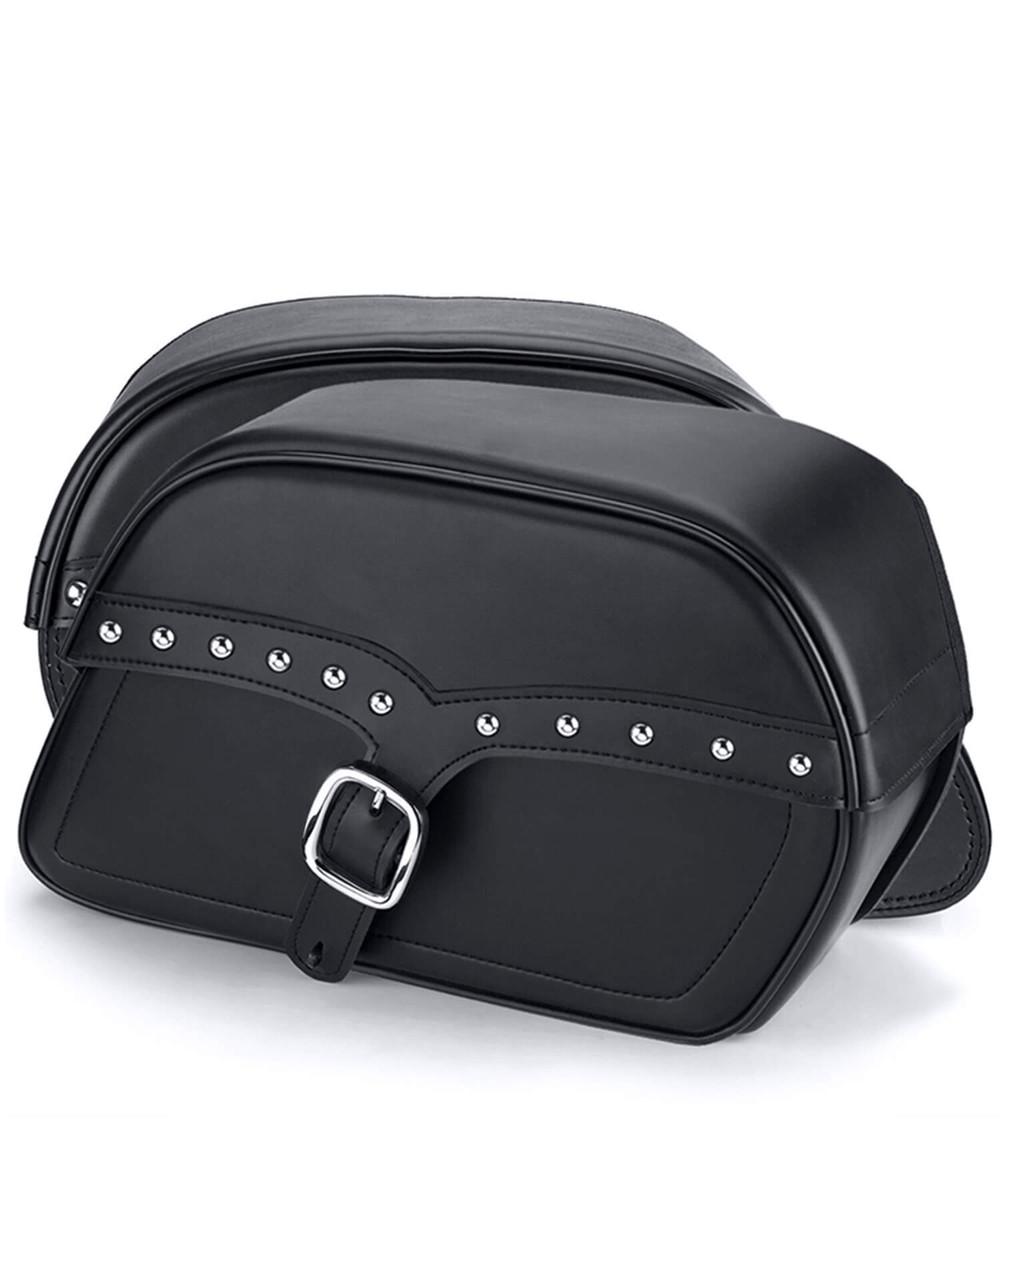 Honda 1100 Shadow Aero SS Slanted Studd Medium Motorcycle Saddlebags Both Bags View